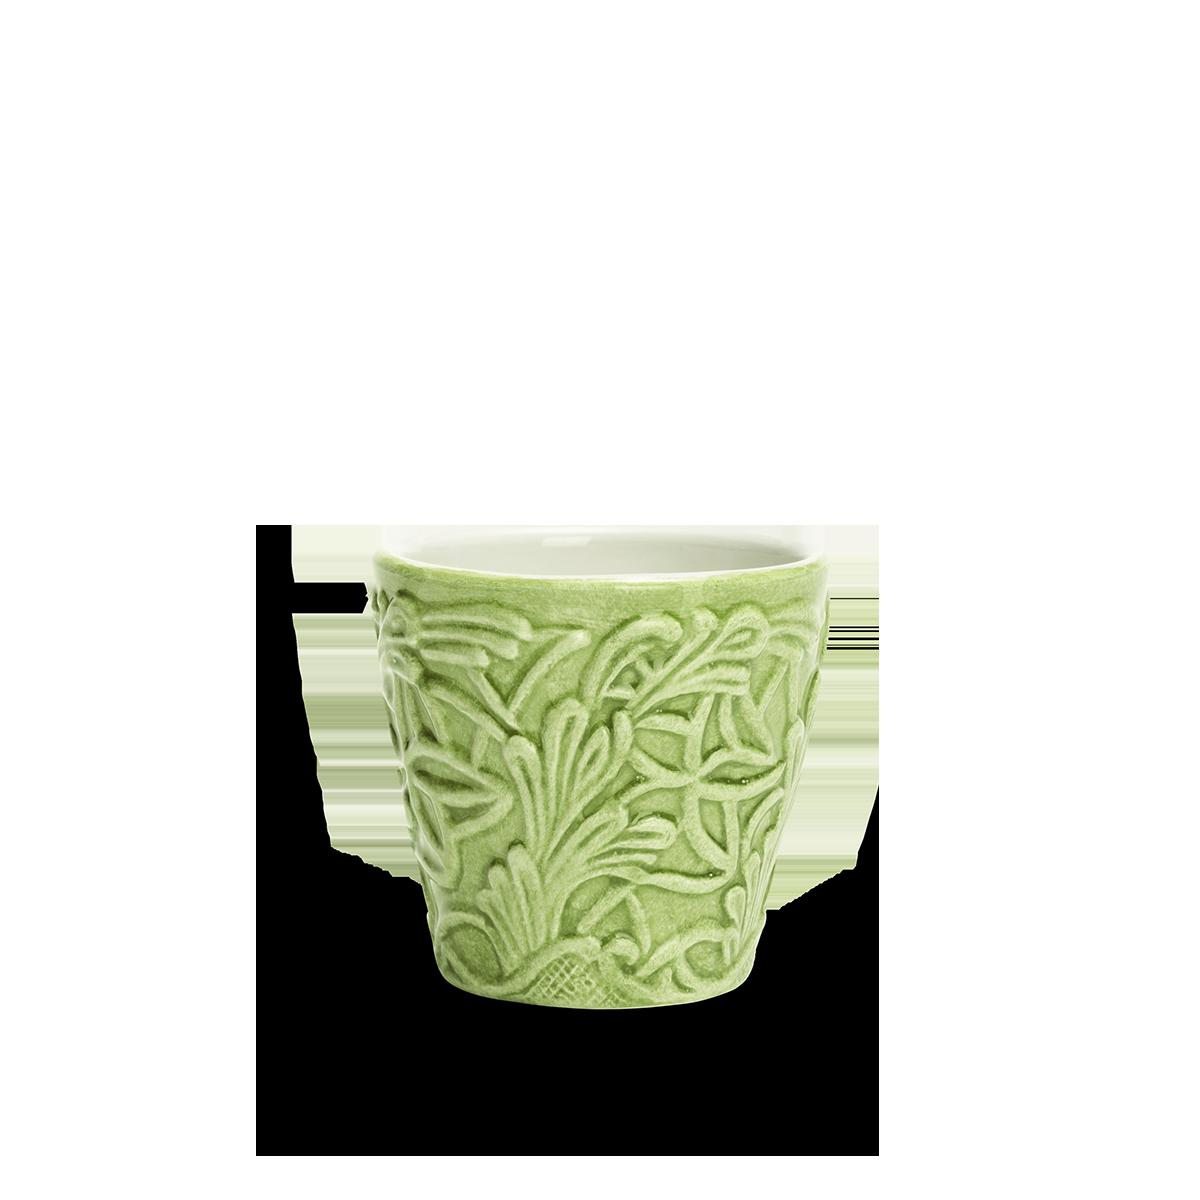 Spets Espressokopp Grön 10 cl